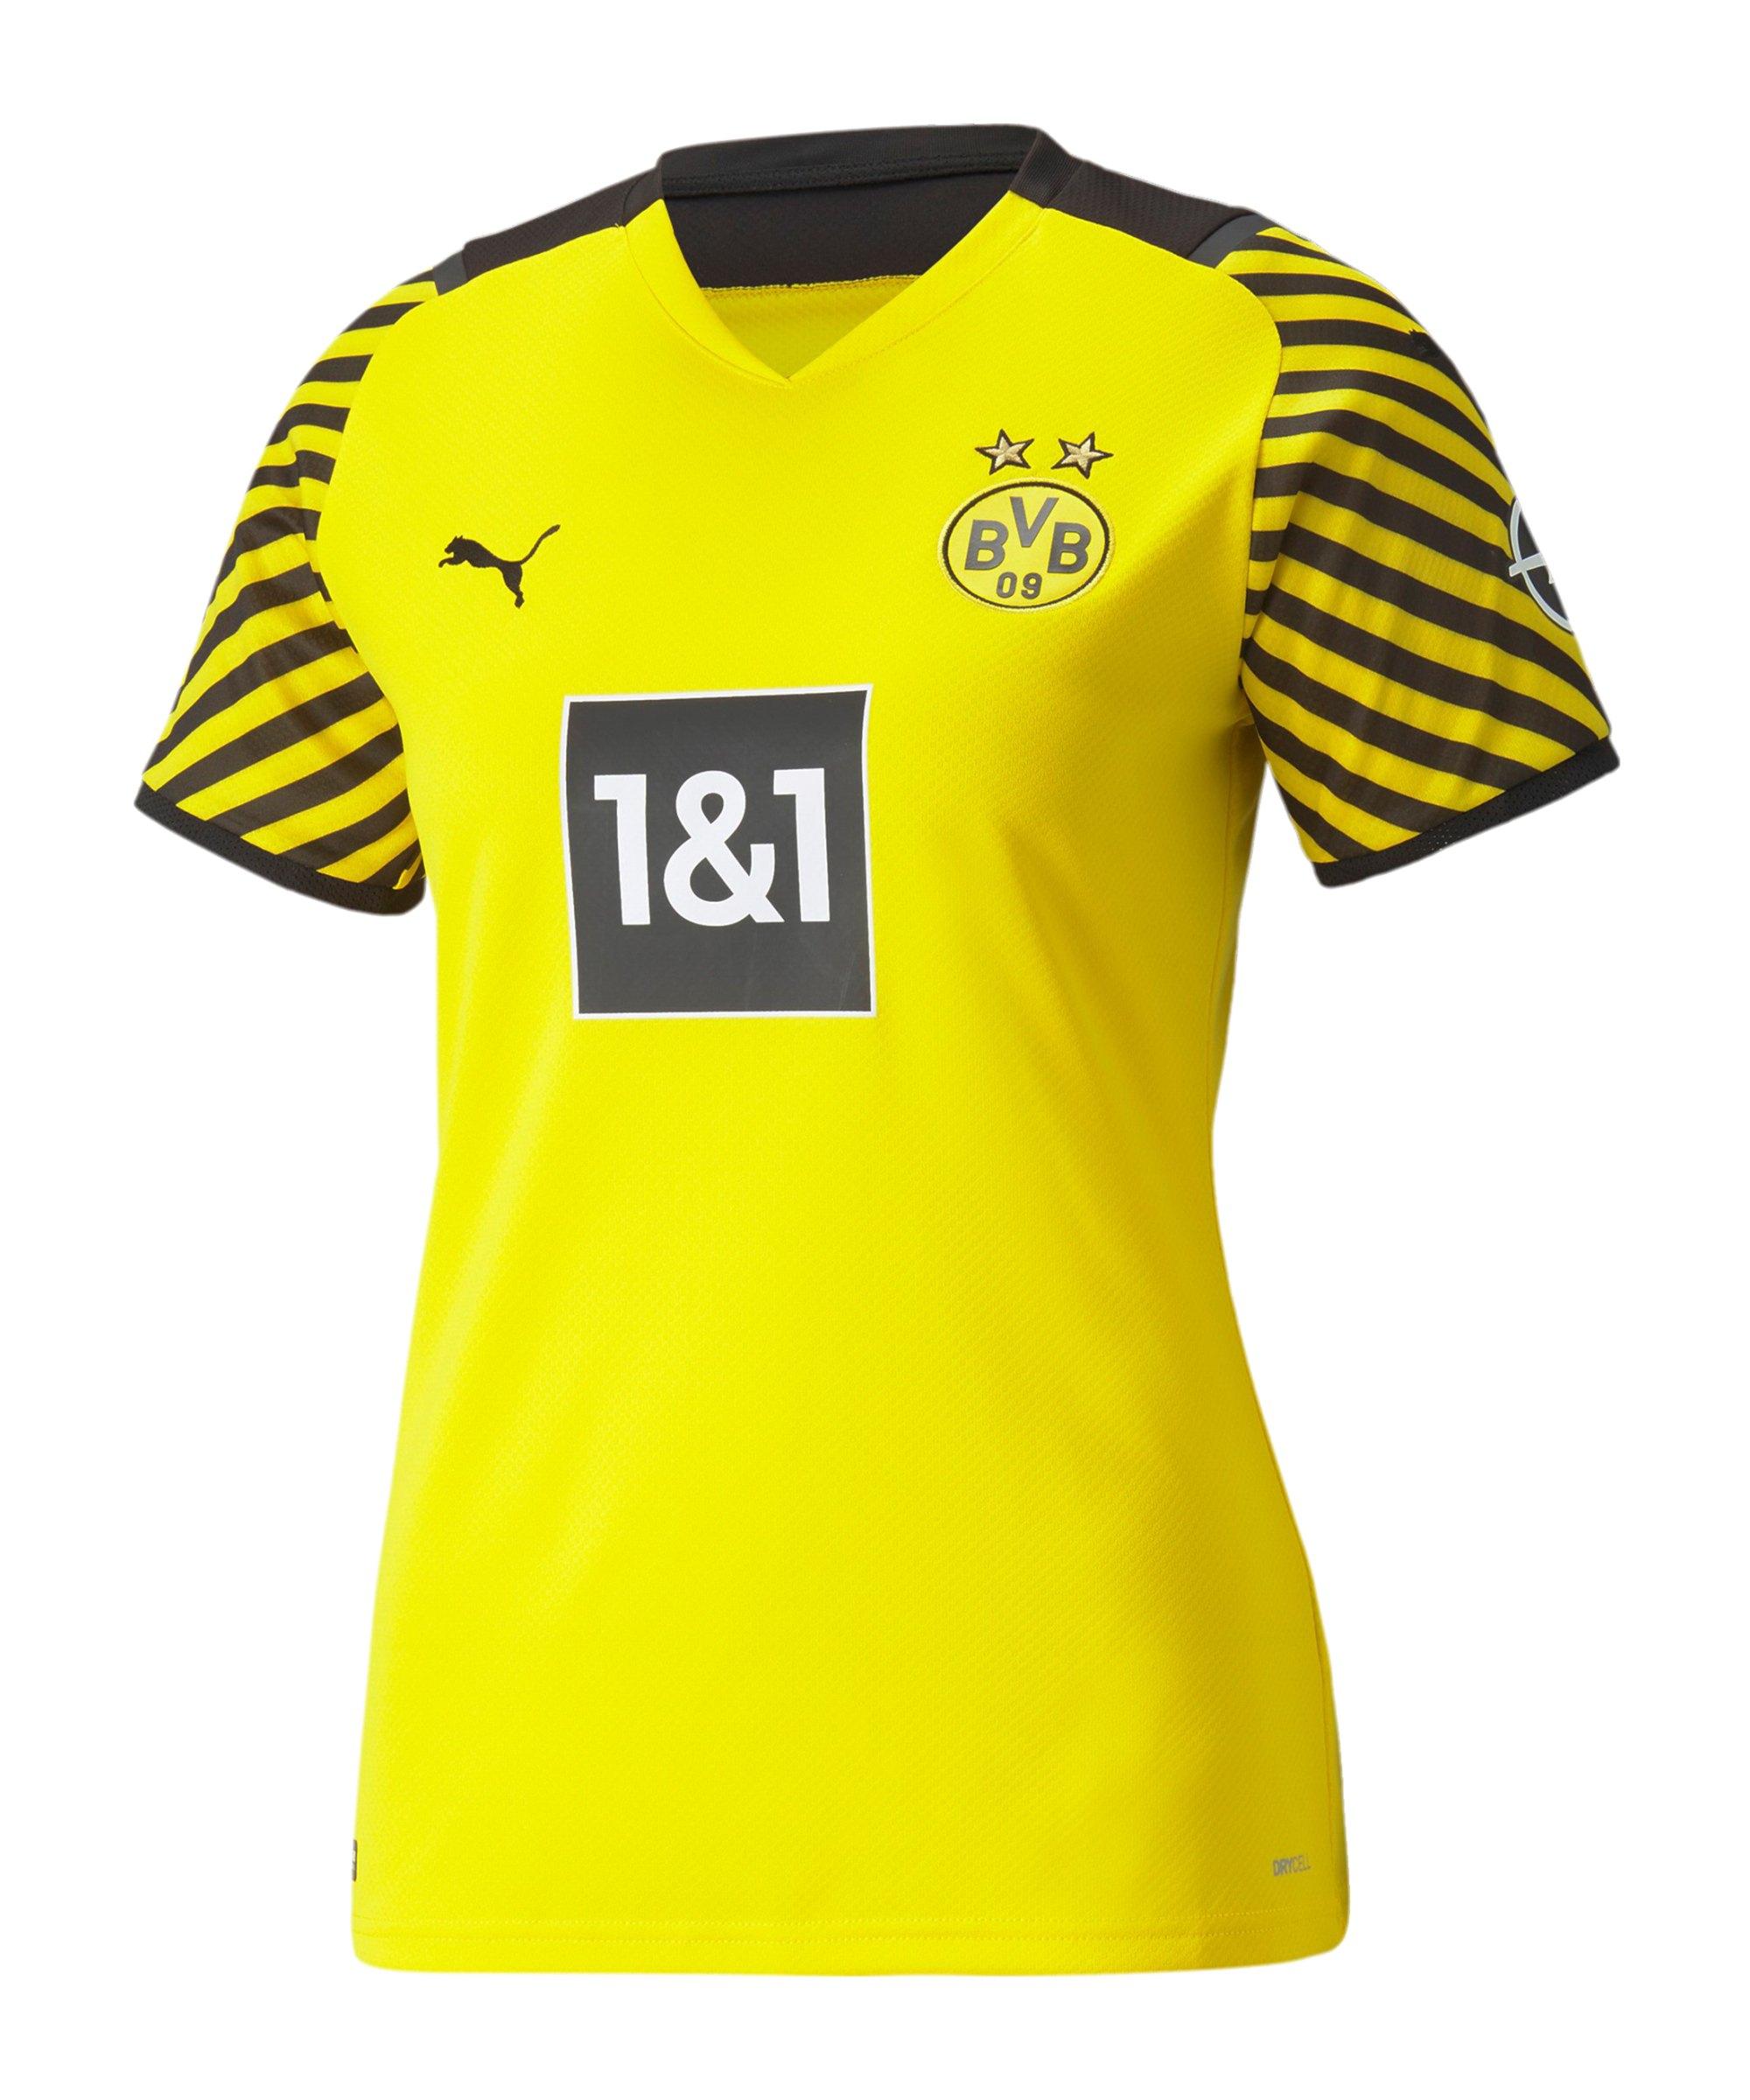 PUMA BVB Dortmund Trikot Home 2021/2022 Damen Gelb F01 - gelb